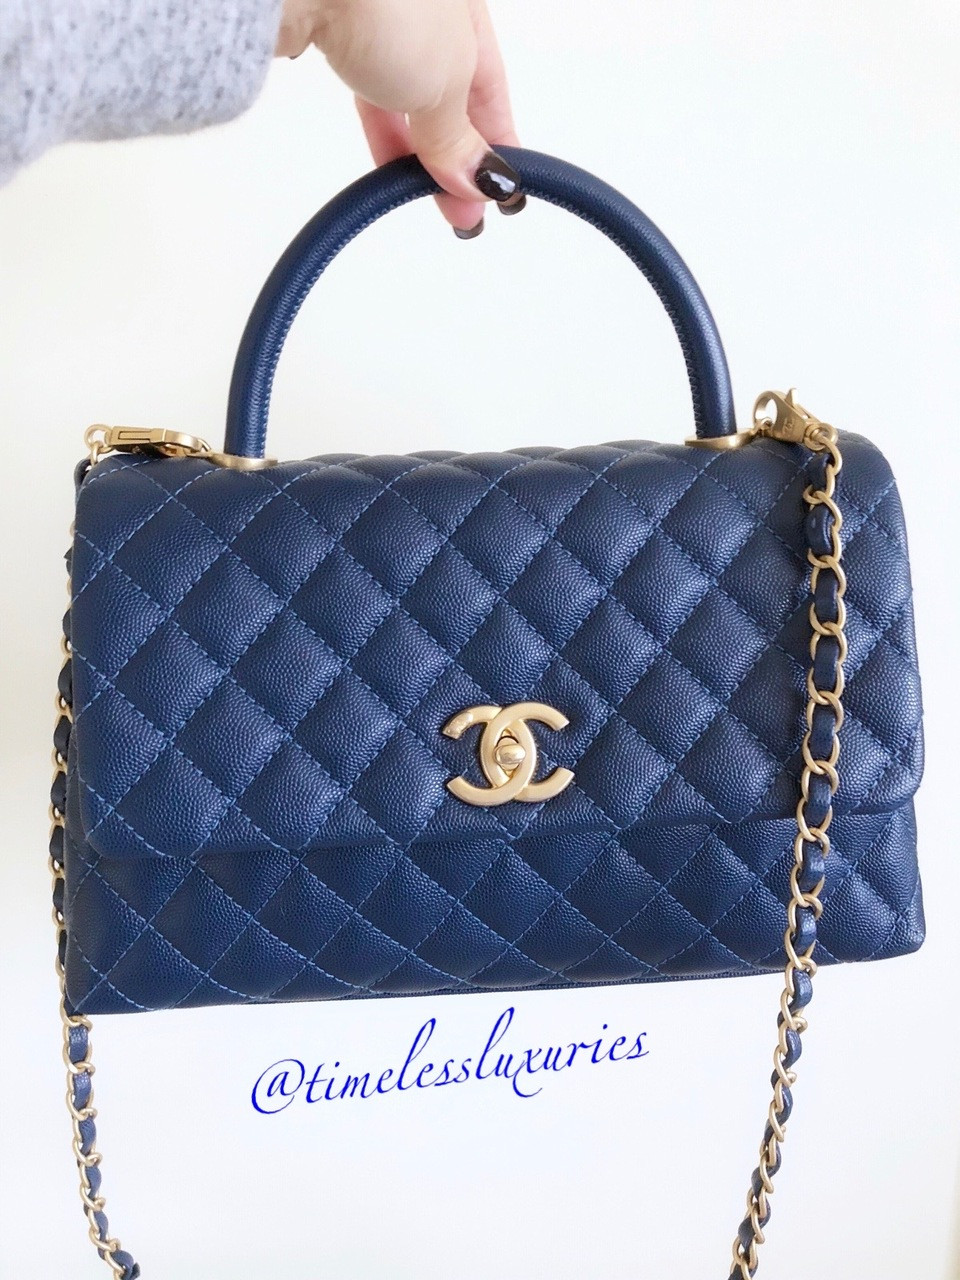 1cc6ea0fd7e6 CHANEL 2018 Blue Caviar Coco Handle Bag Gold Hw #25709771 - Timeless ...